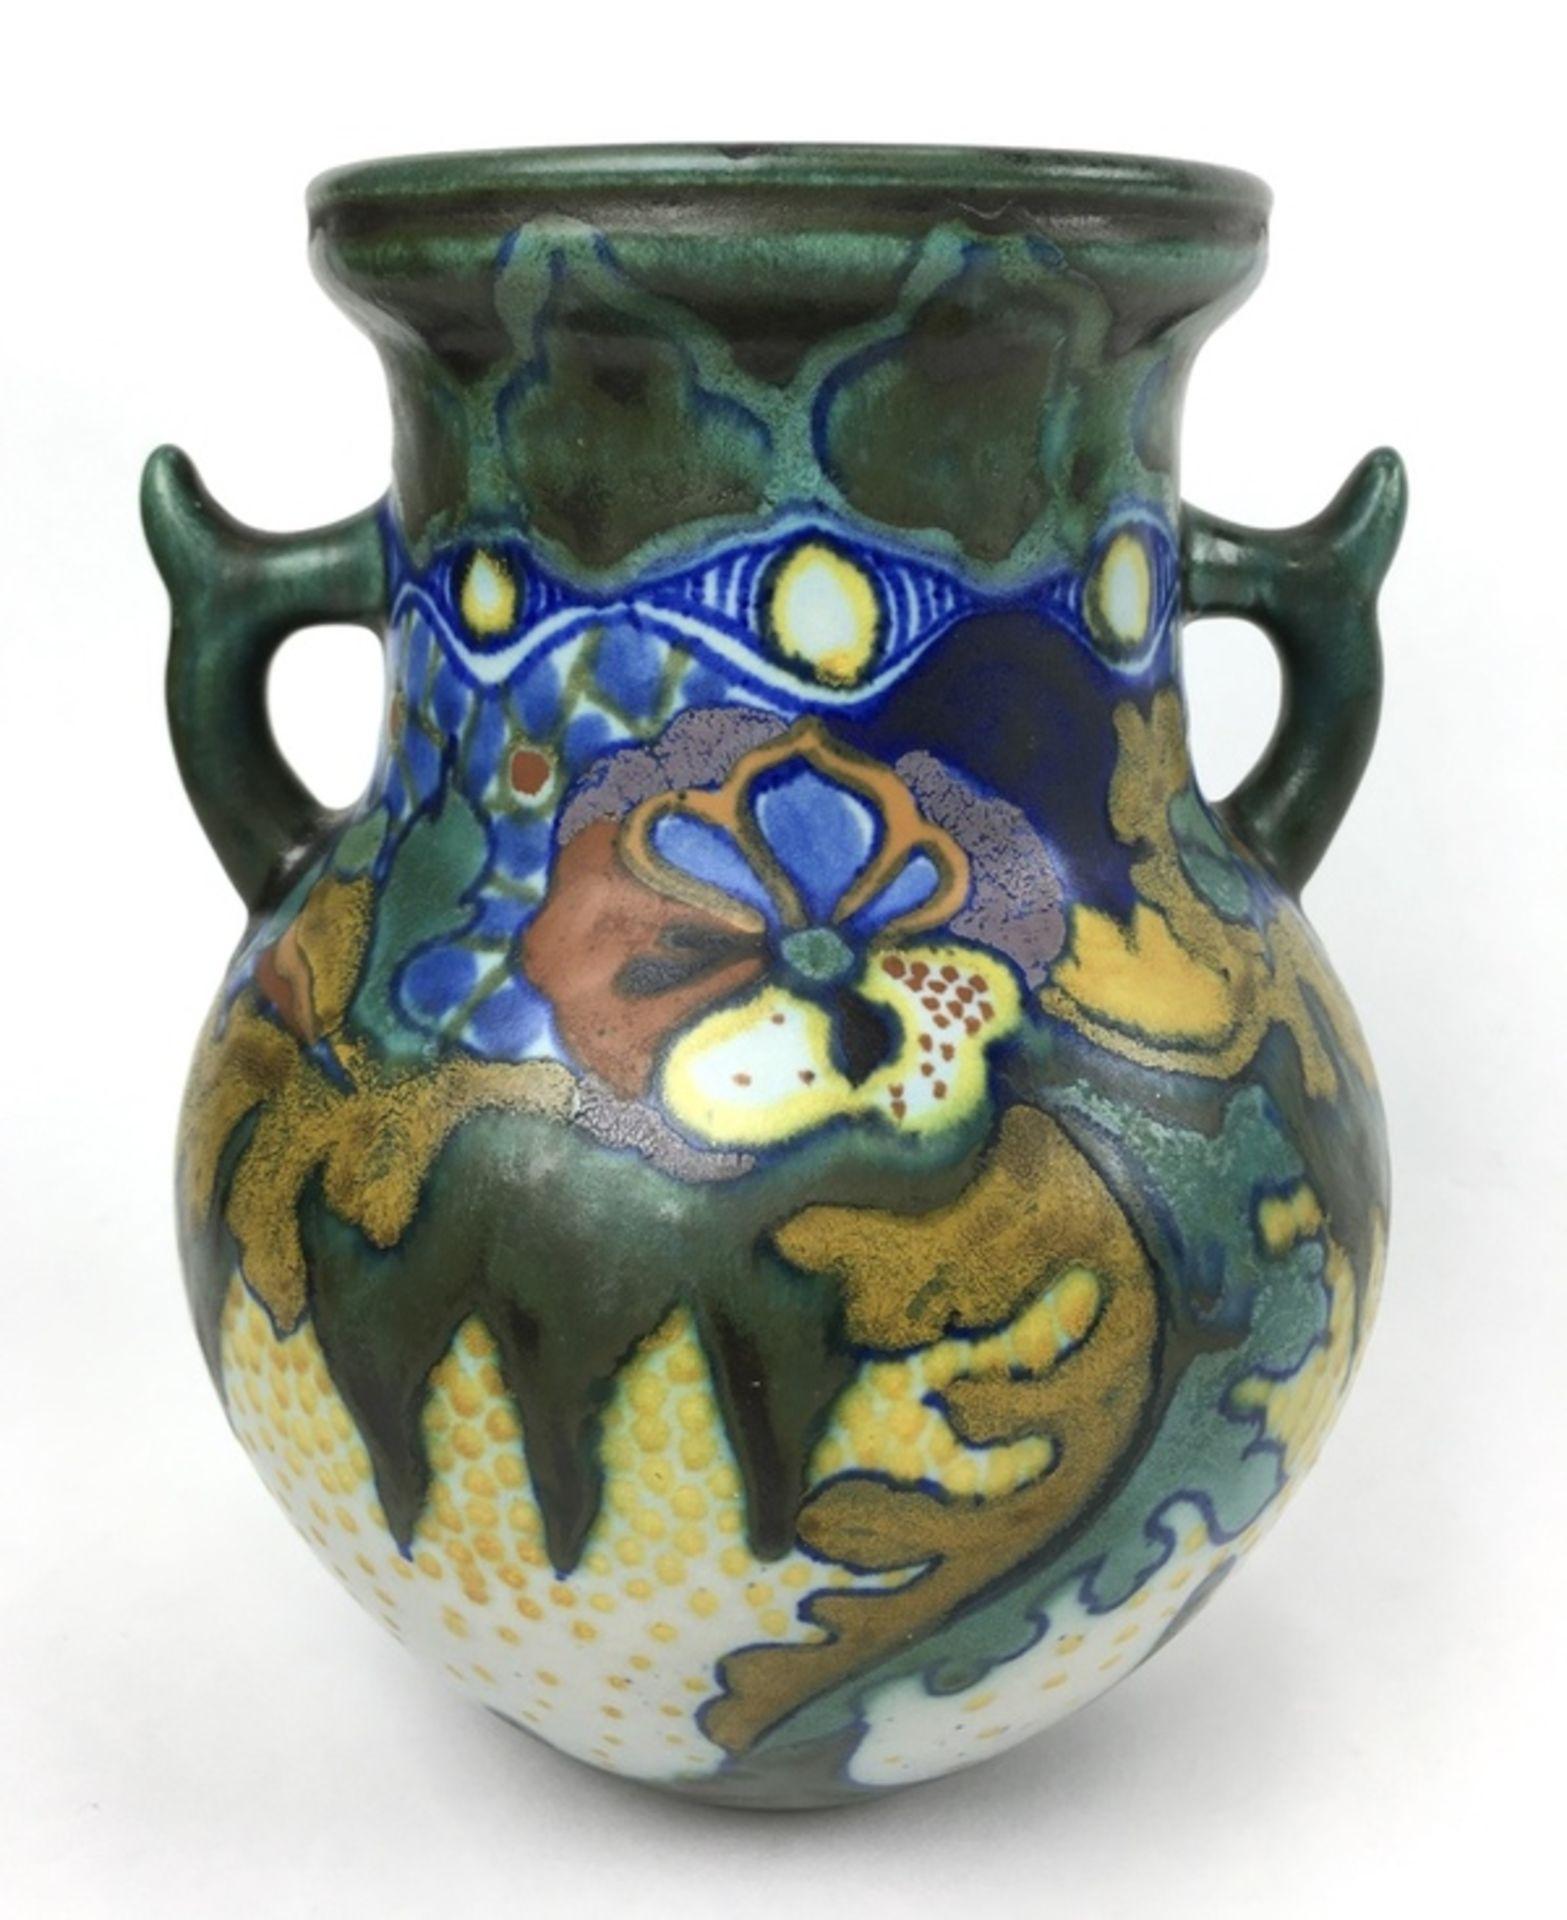 (Toegpaste kunst) Amfora vaas, plateelbakkerij Zuid-HollandAardewerk amfora vaas met decor Coro - Image 3 of 5